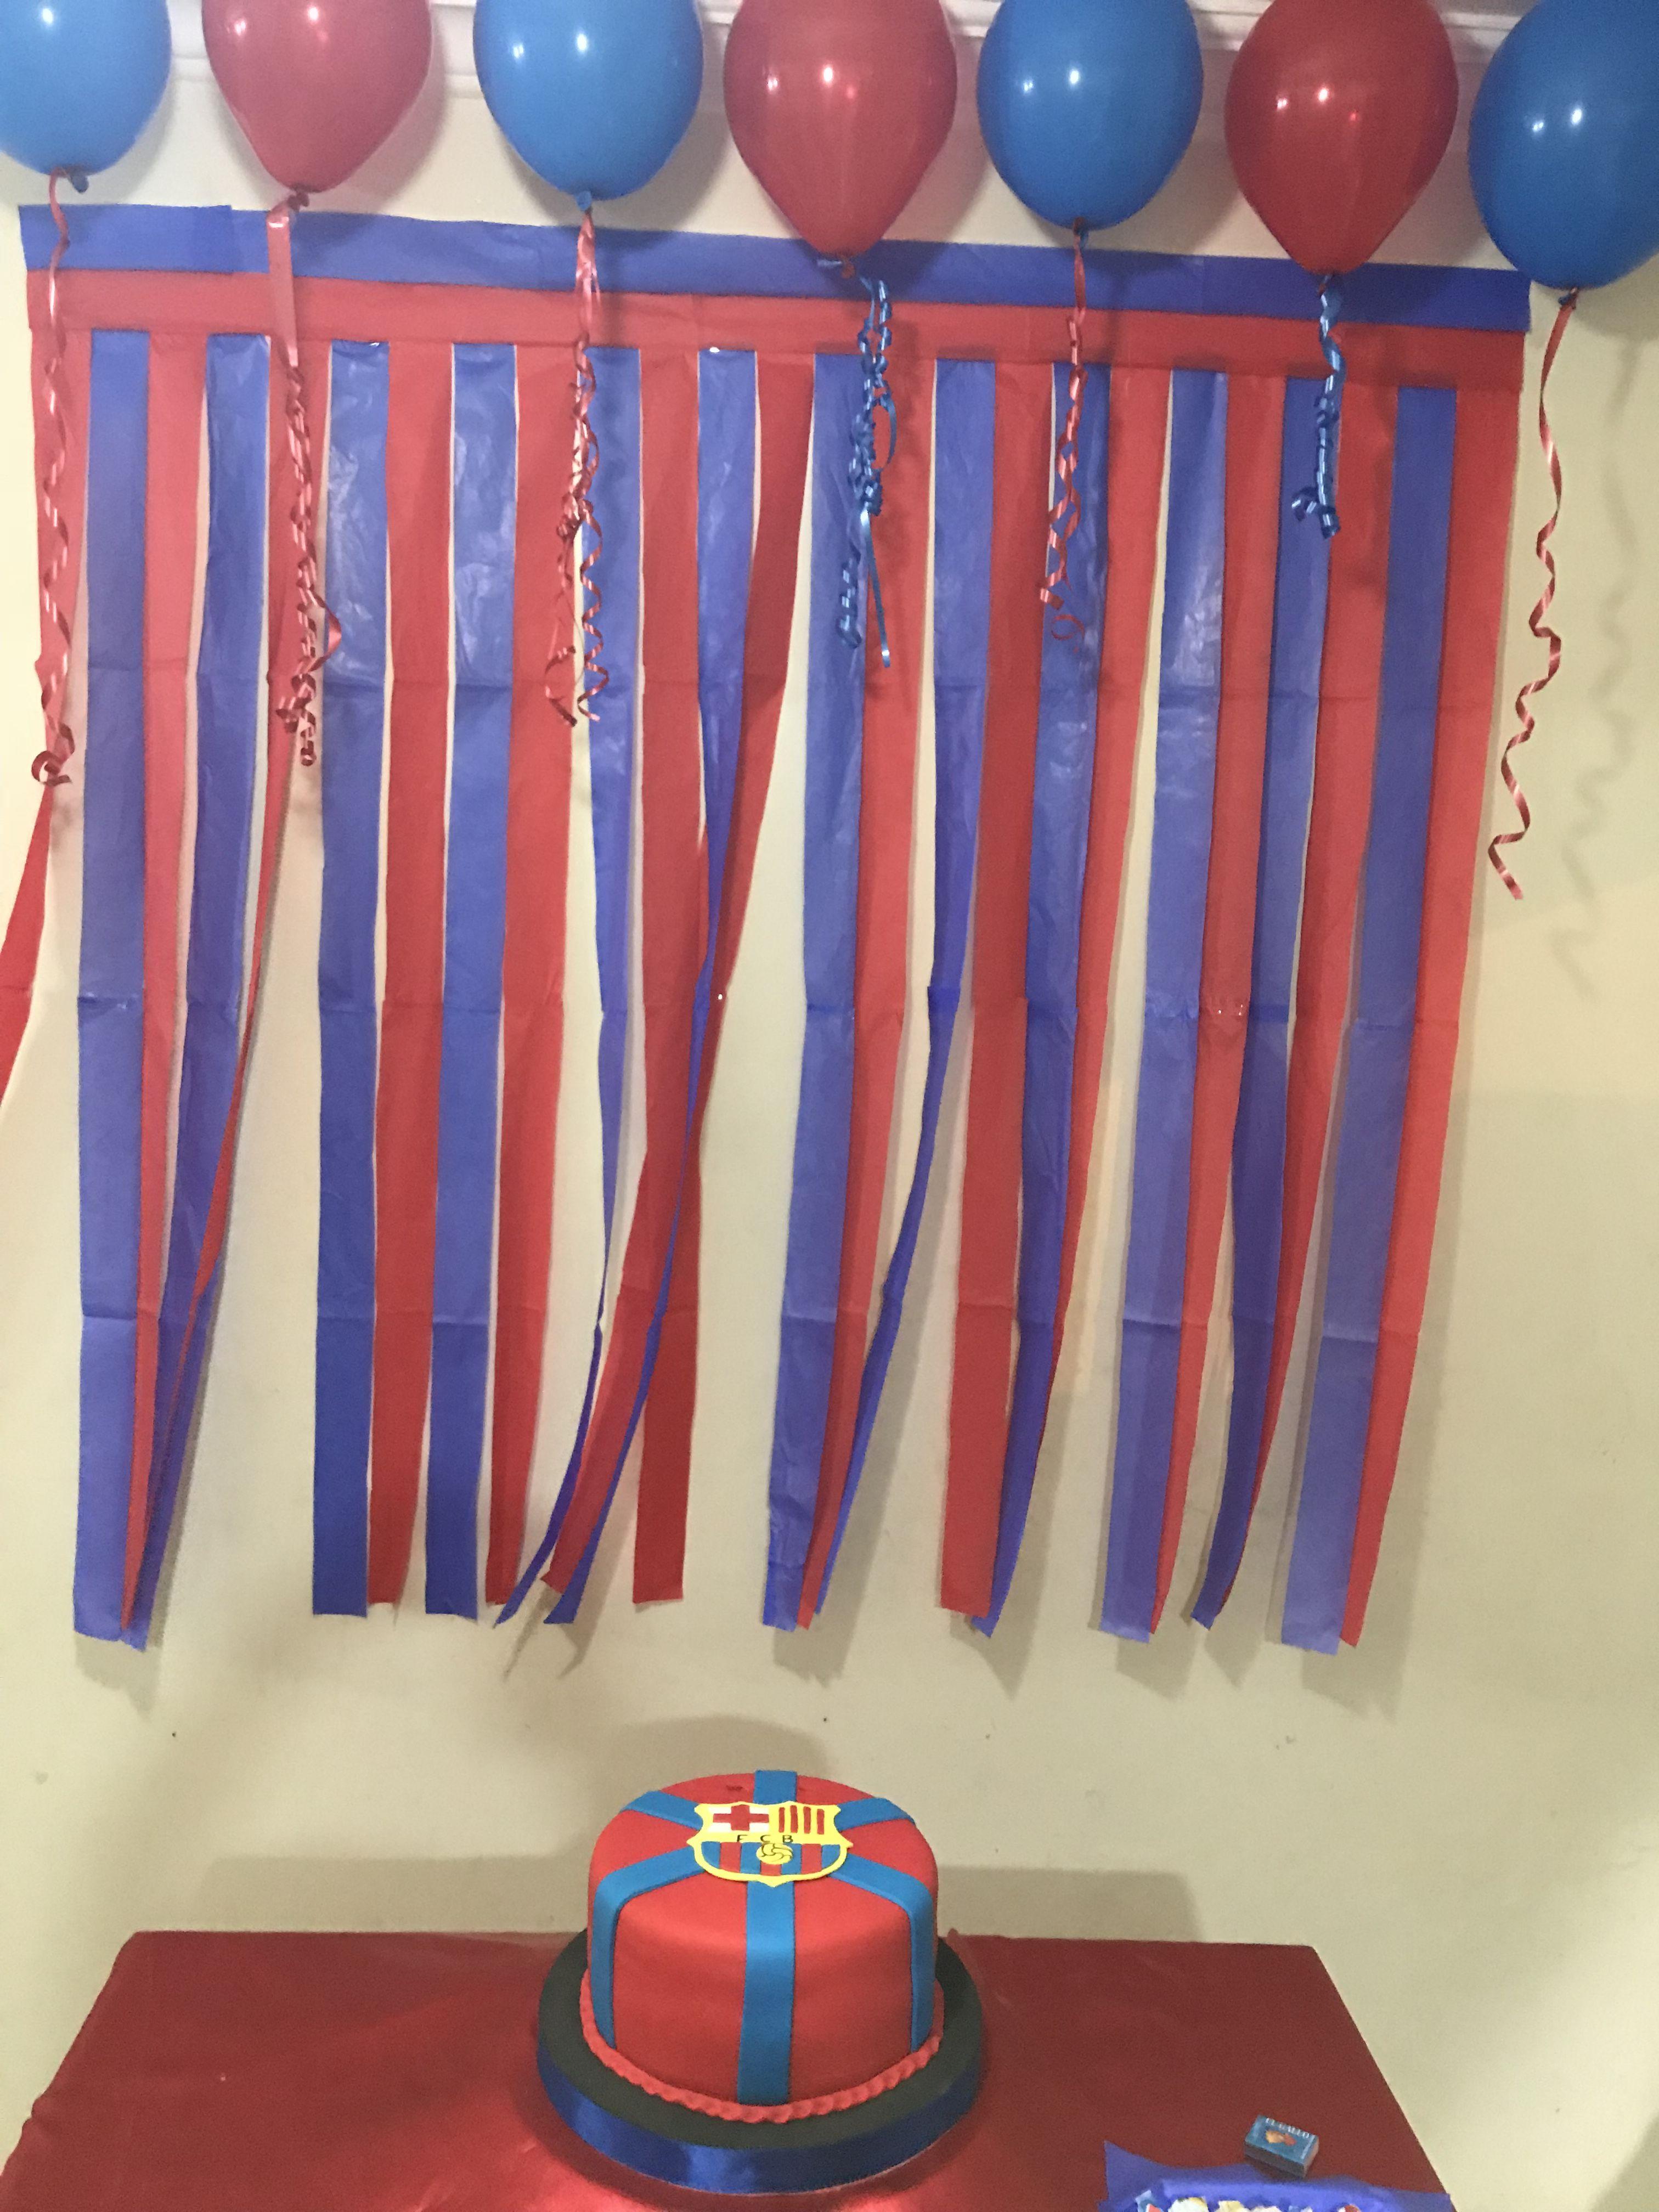 Pin By Diana Beltran On Fiestas Y Algo Mas Soccer Birthday Parties Soccer Birthday Superhero Birthday Party